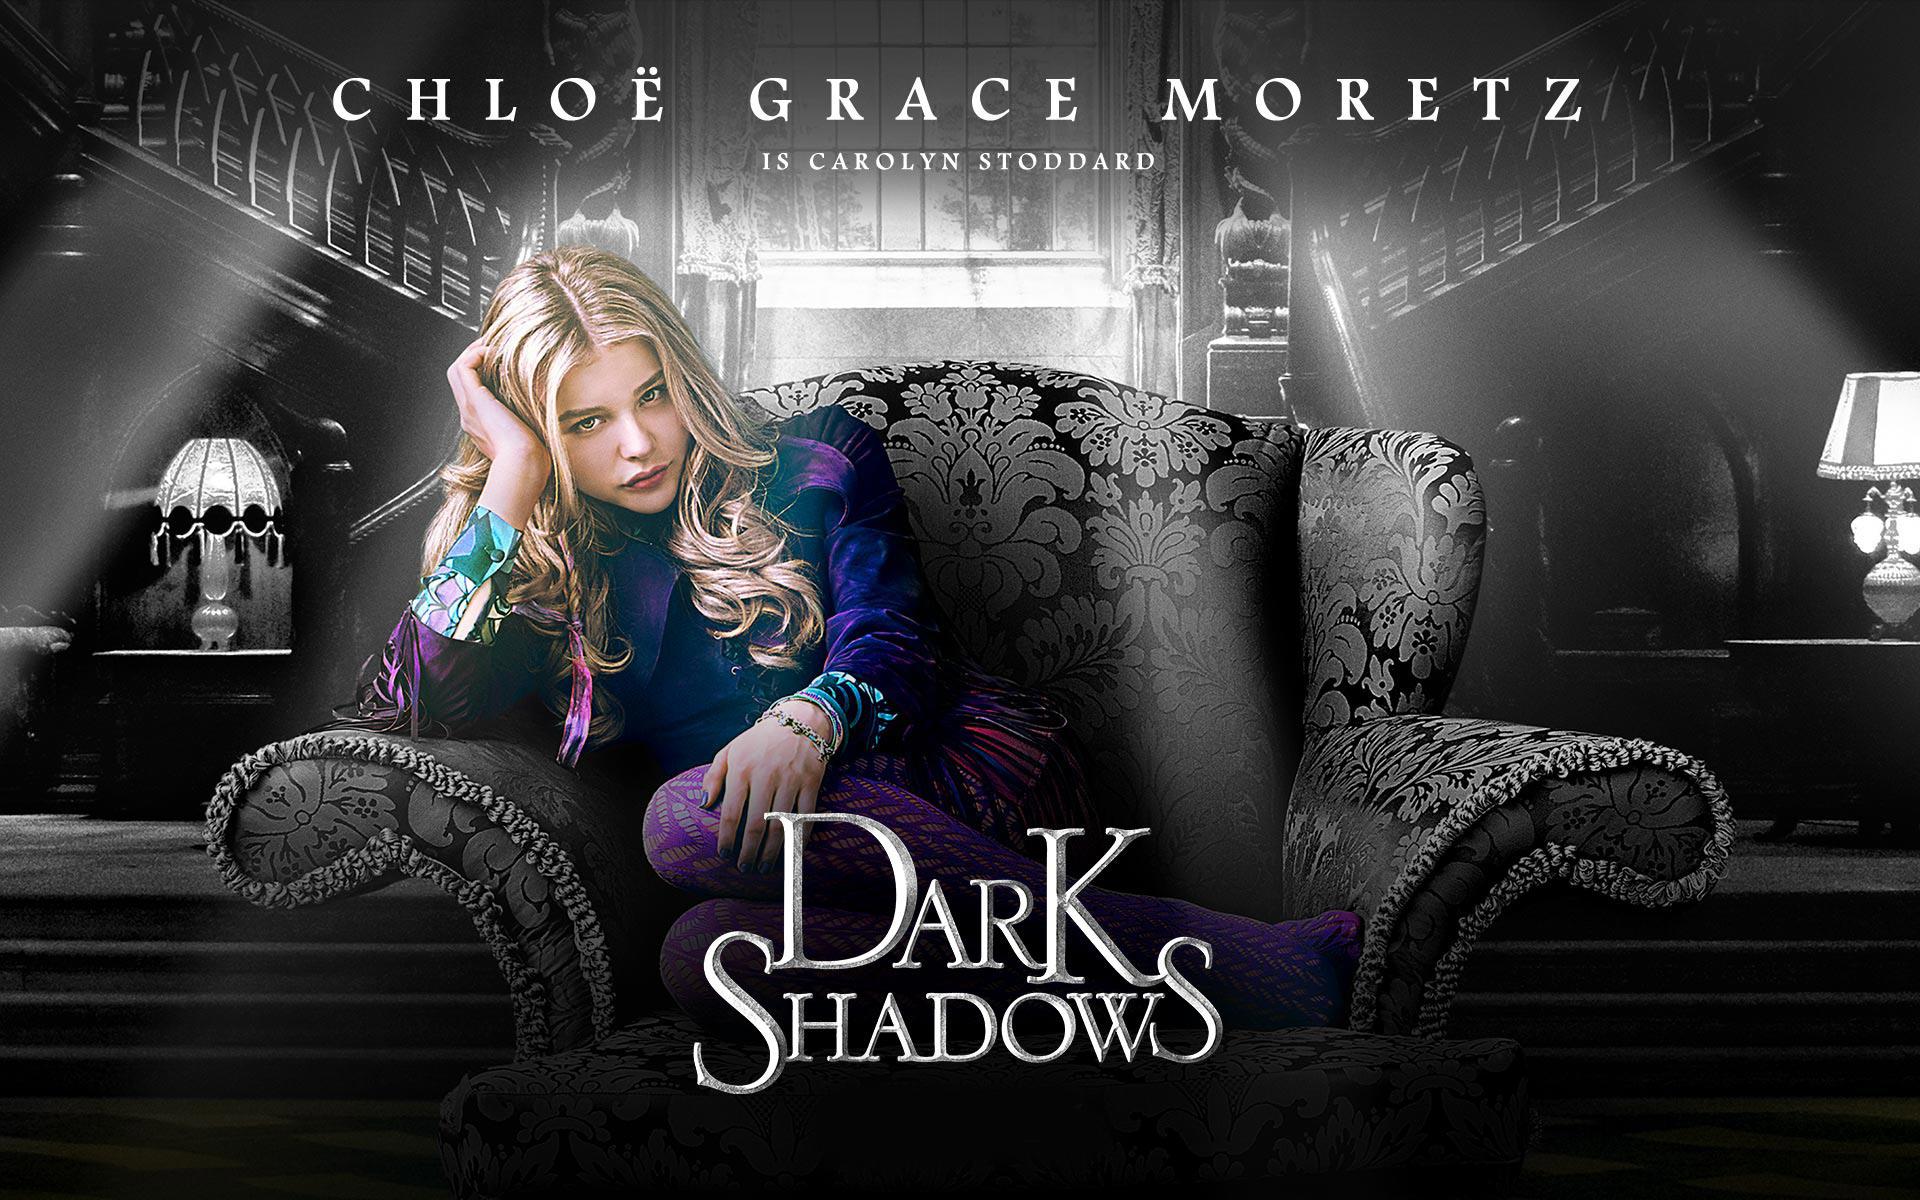 Chloe Moretz Dark Shadows Wallpapers HD Wallpapers 1920x1200